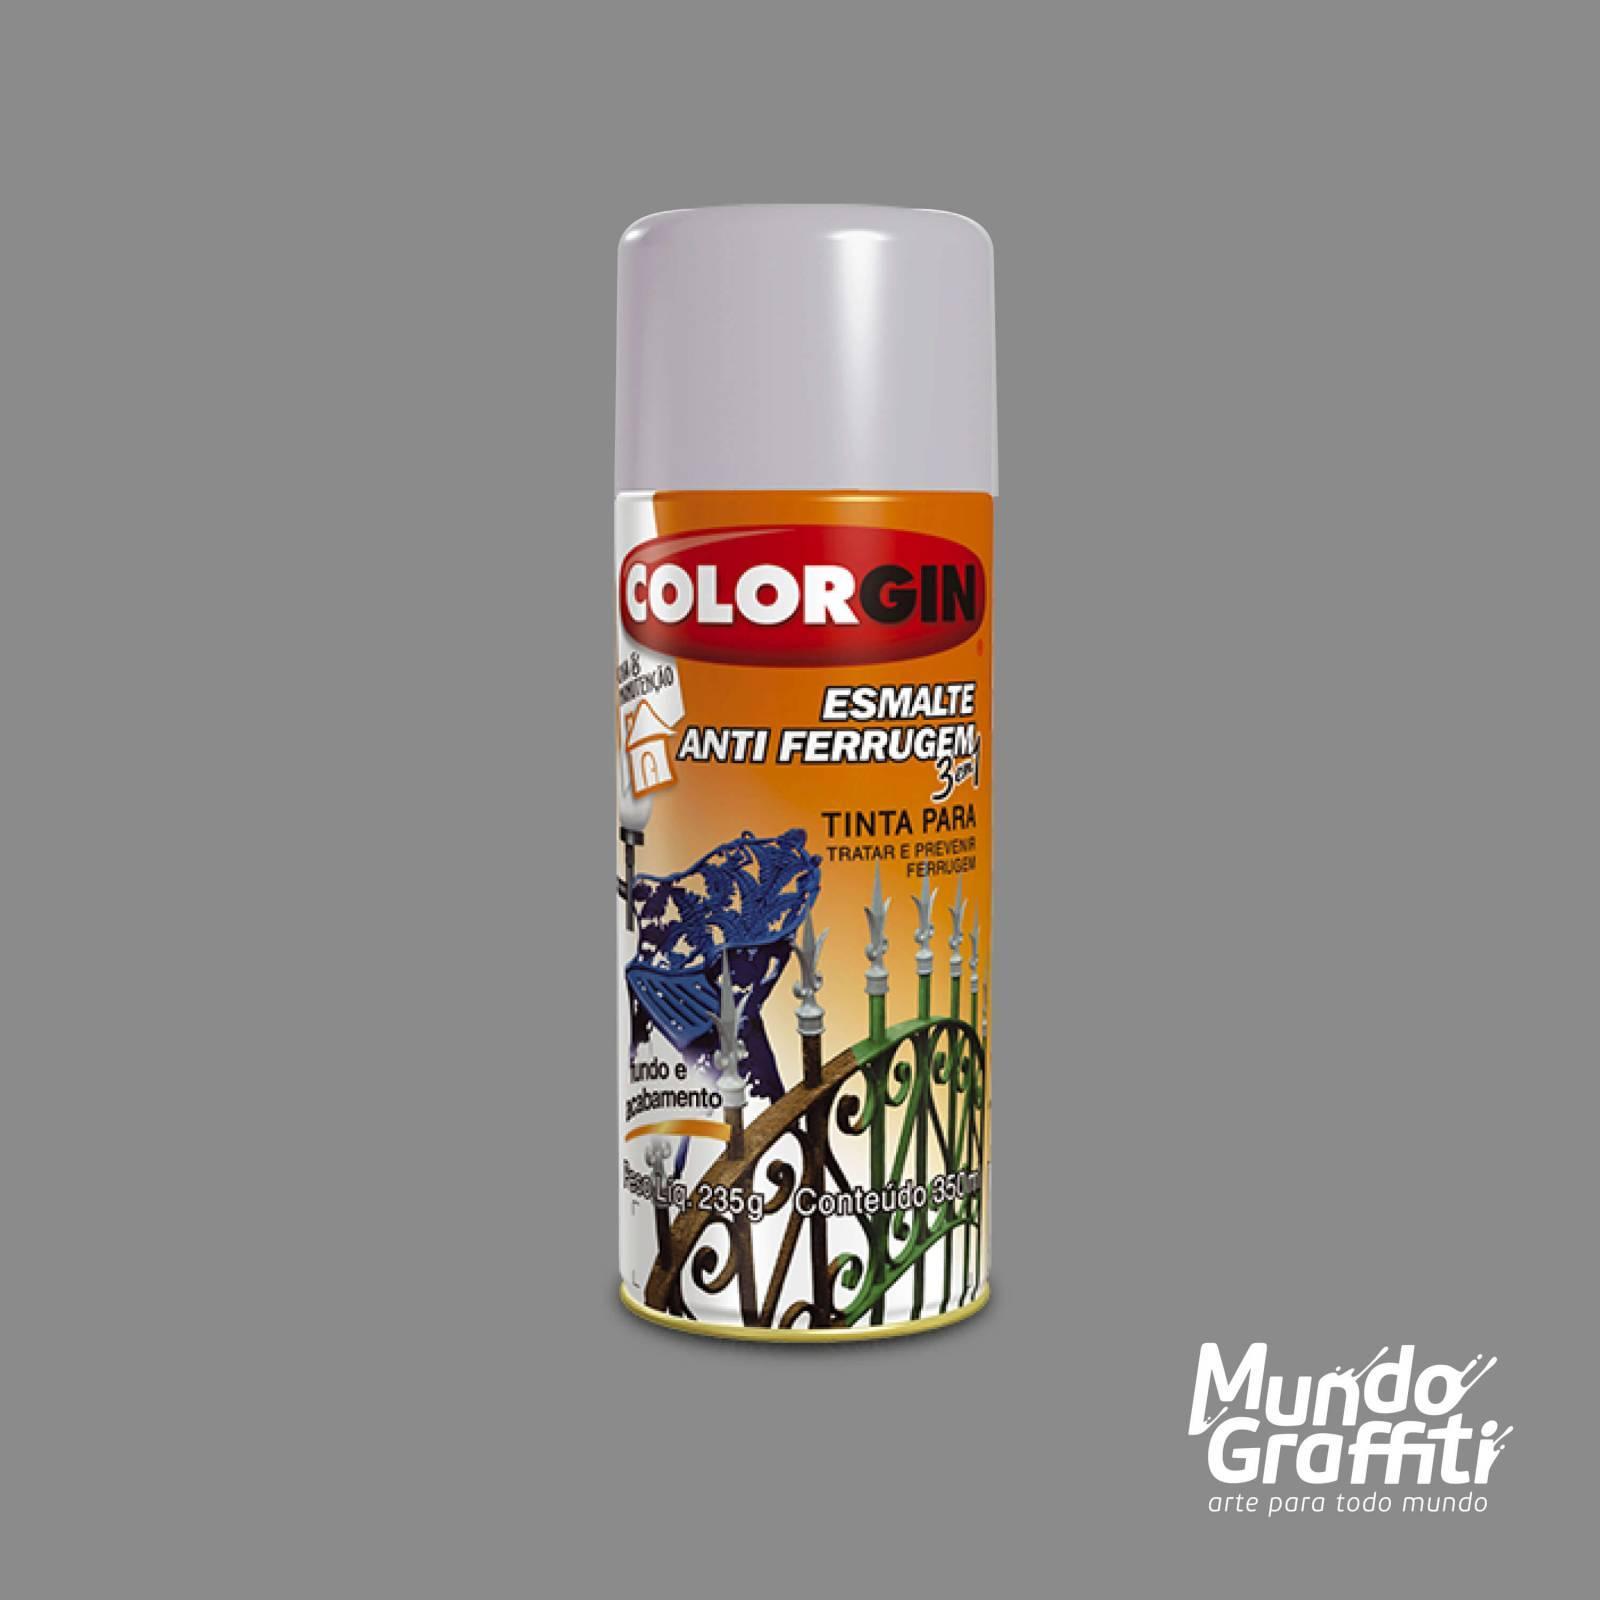 Esmalte Anti Ferrugem 2033 Platina 350ml Colorgin - Mundo Graffiti